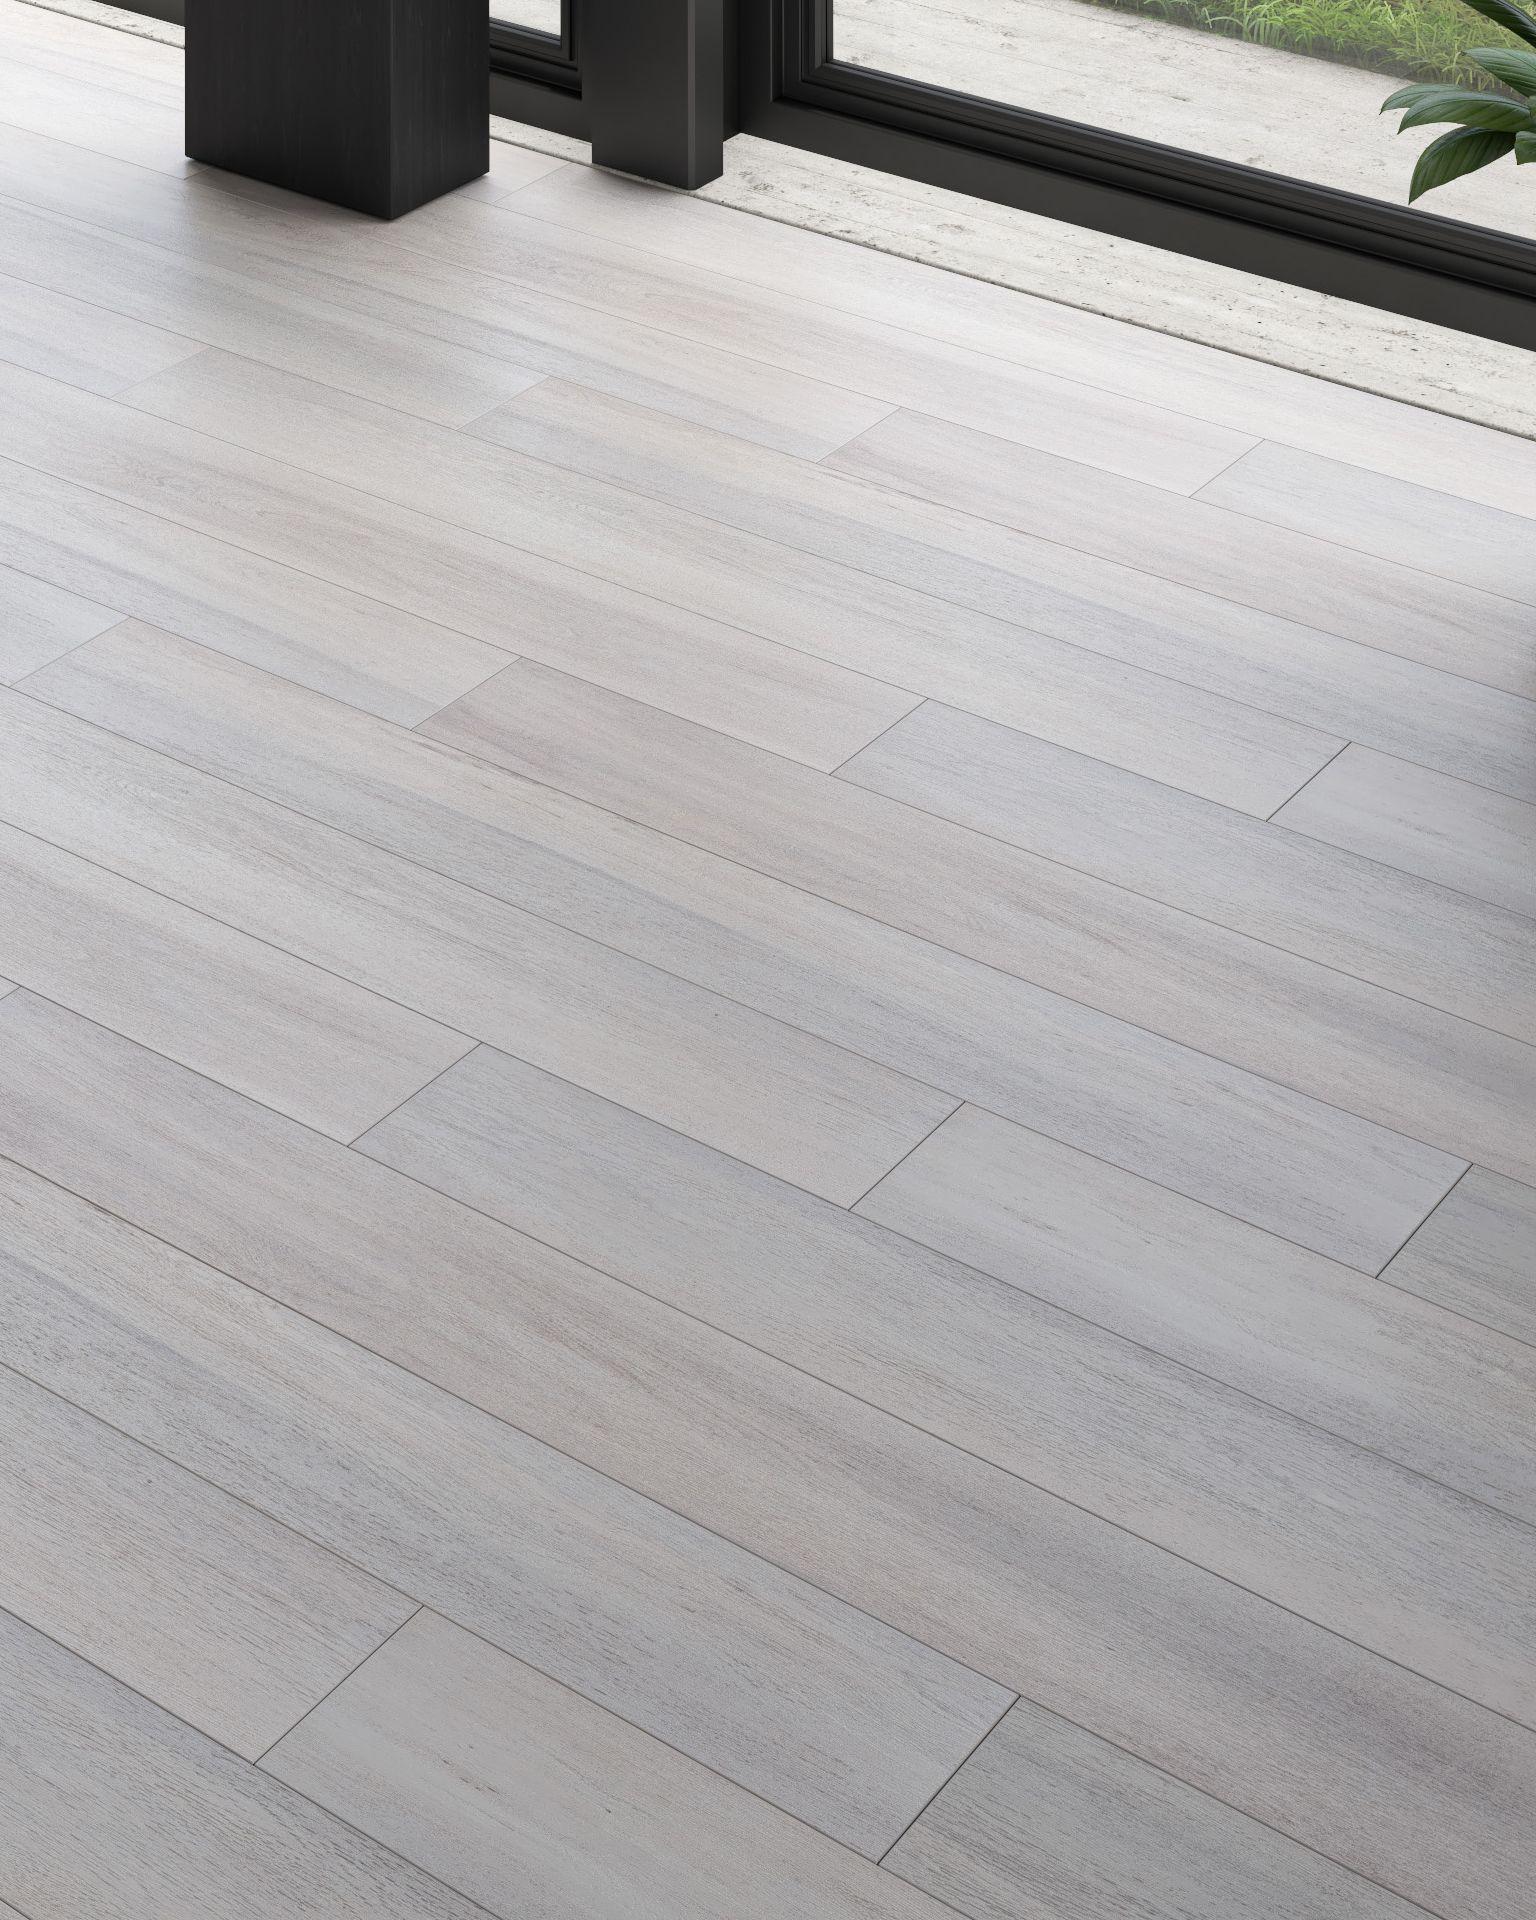 guayacan beige 8 x 48 porcelain wood look tile